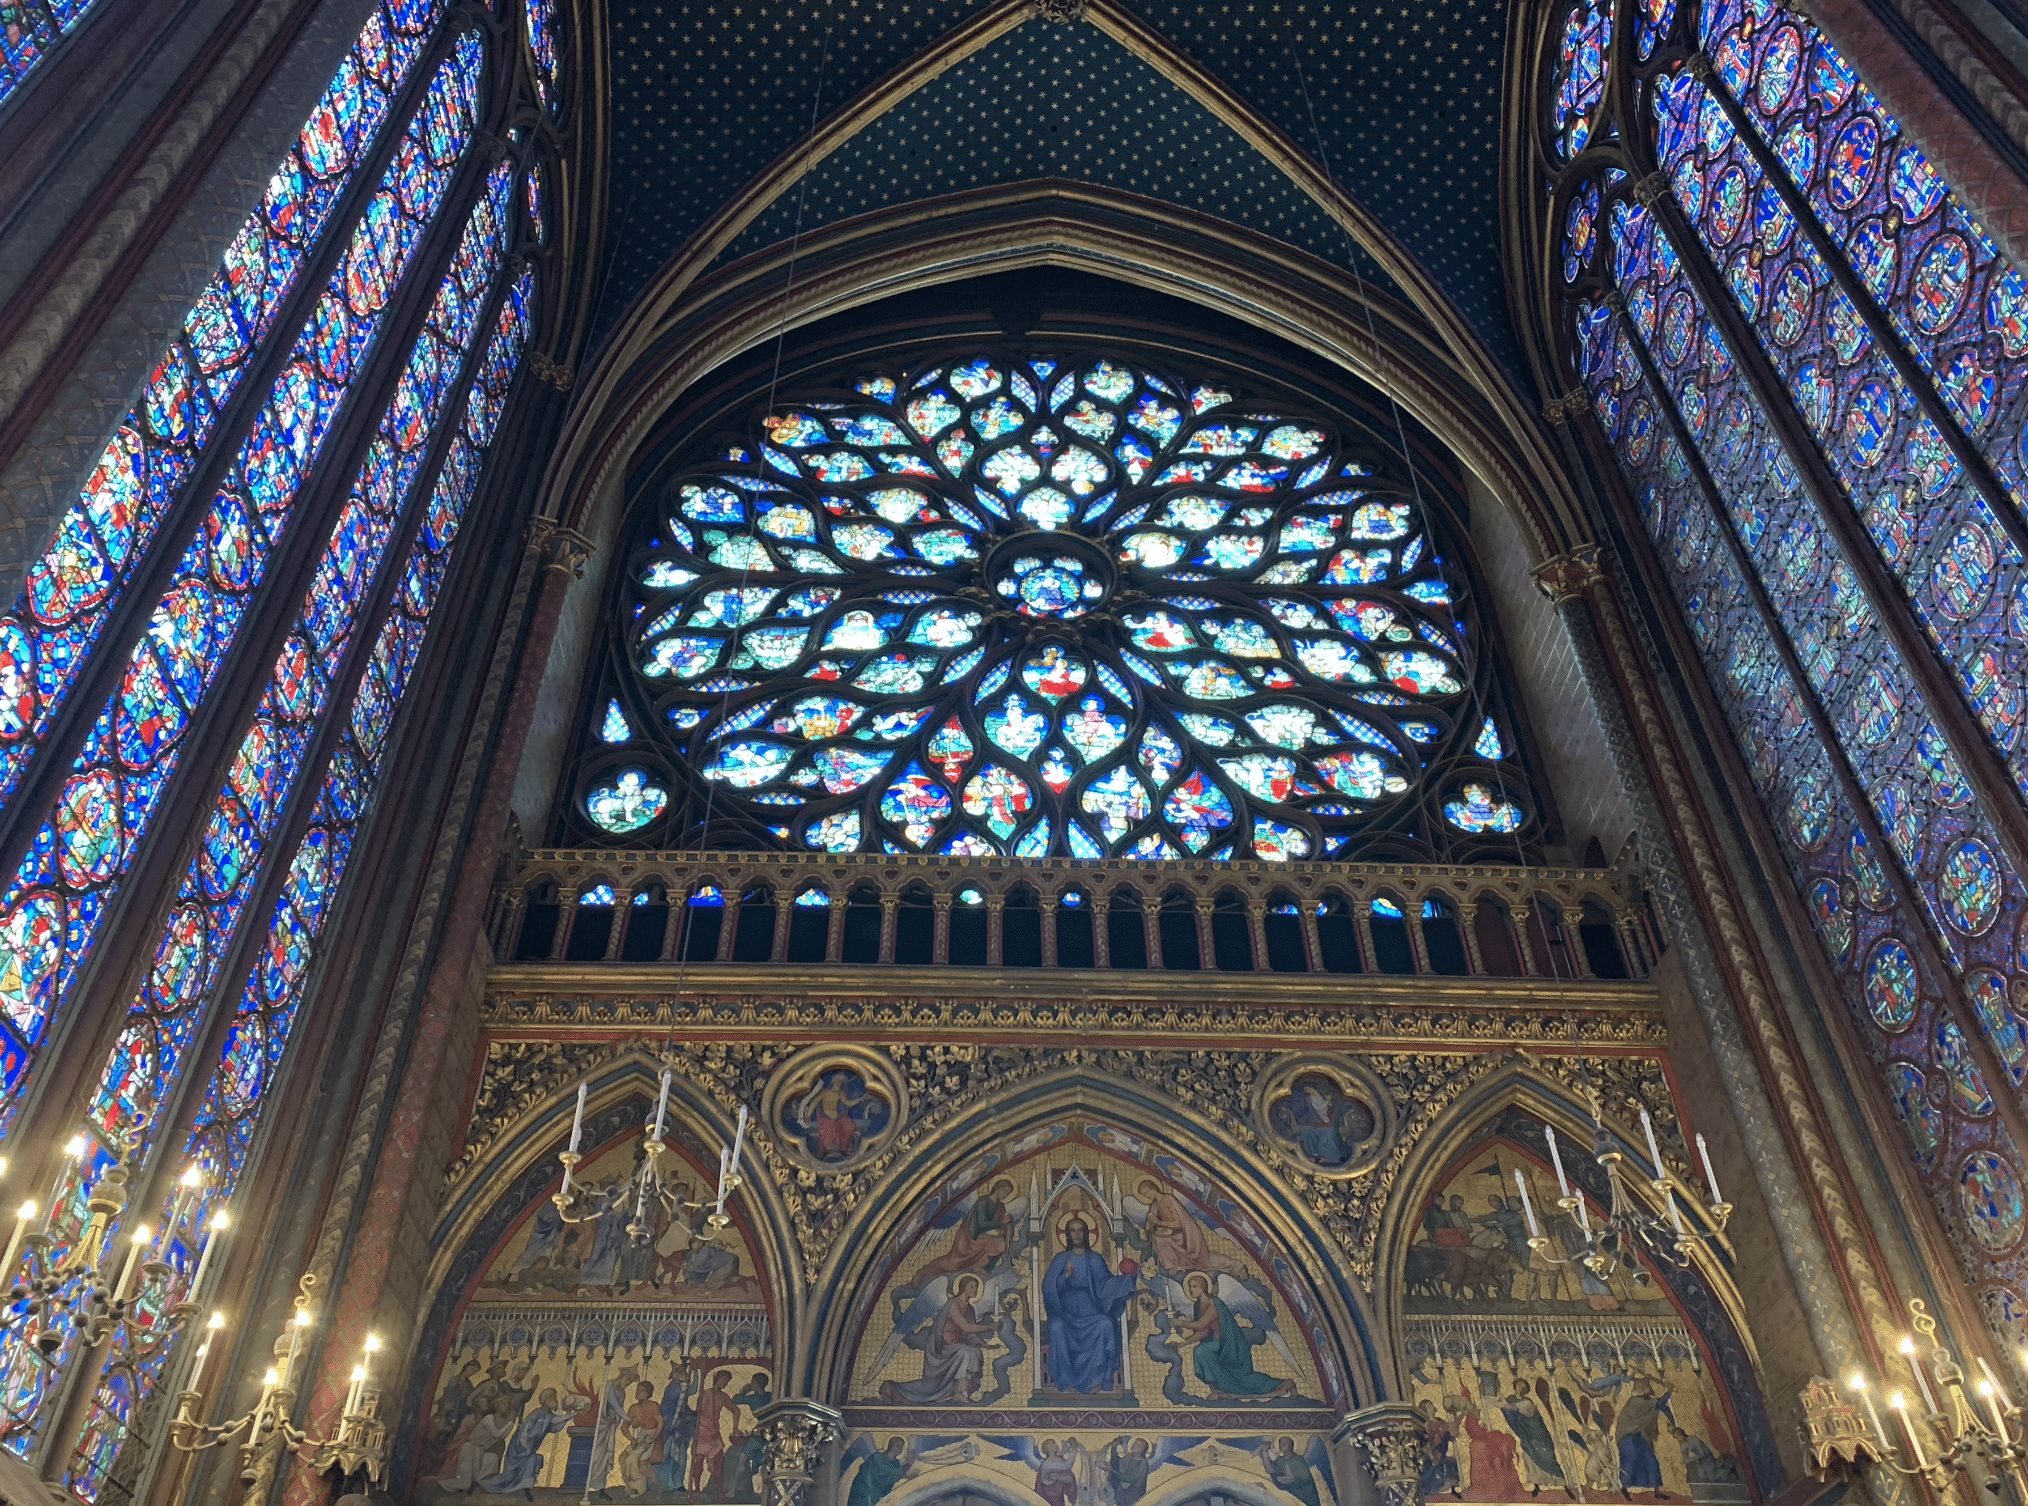 la rosace de la sainte chapelle